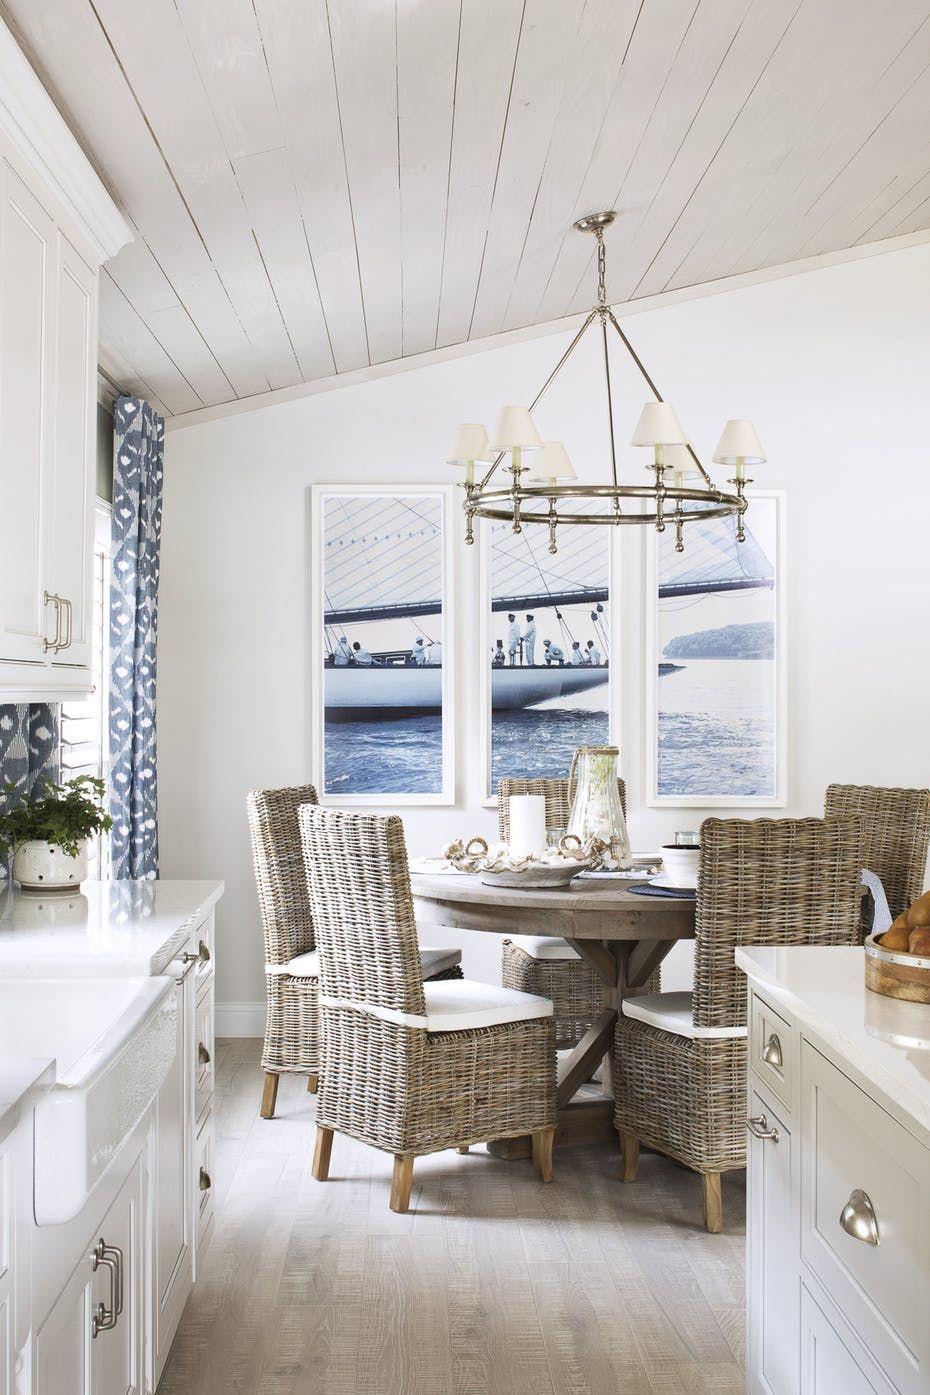 Superb Beach Cottage By Lisa Michael Interiors   Lookbook   Dering Hall